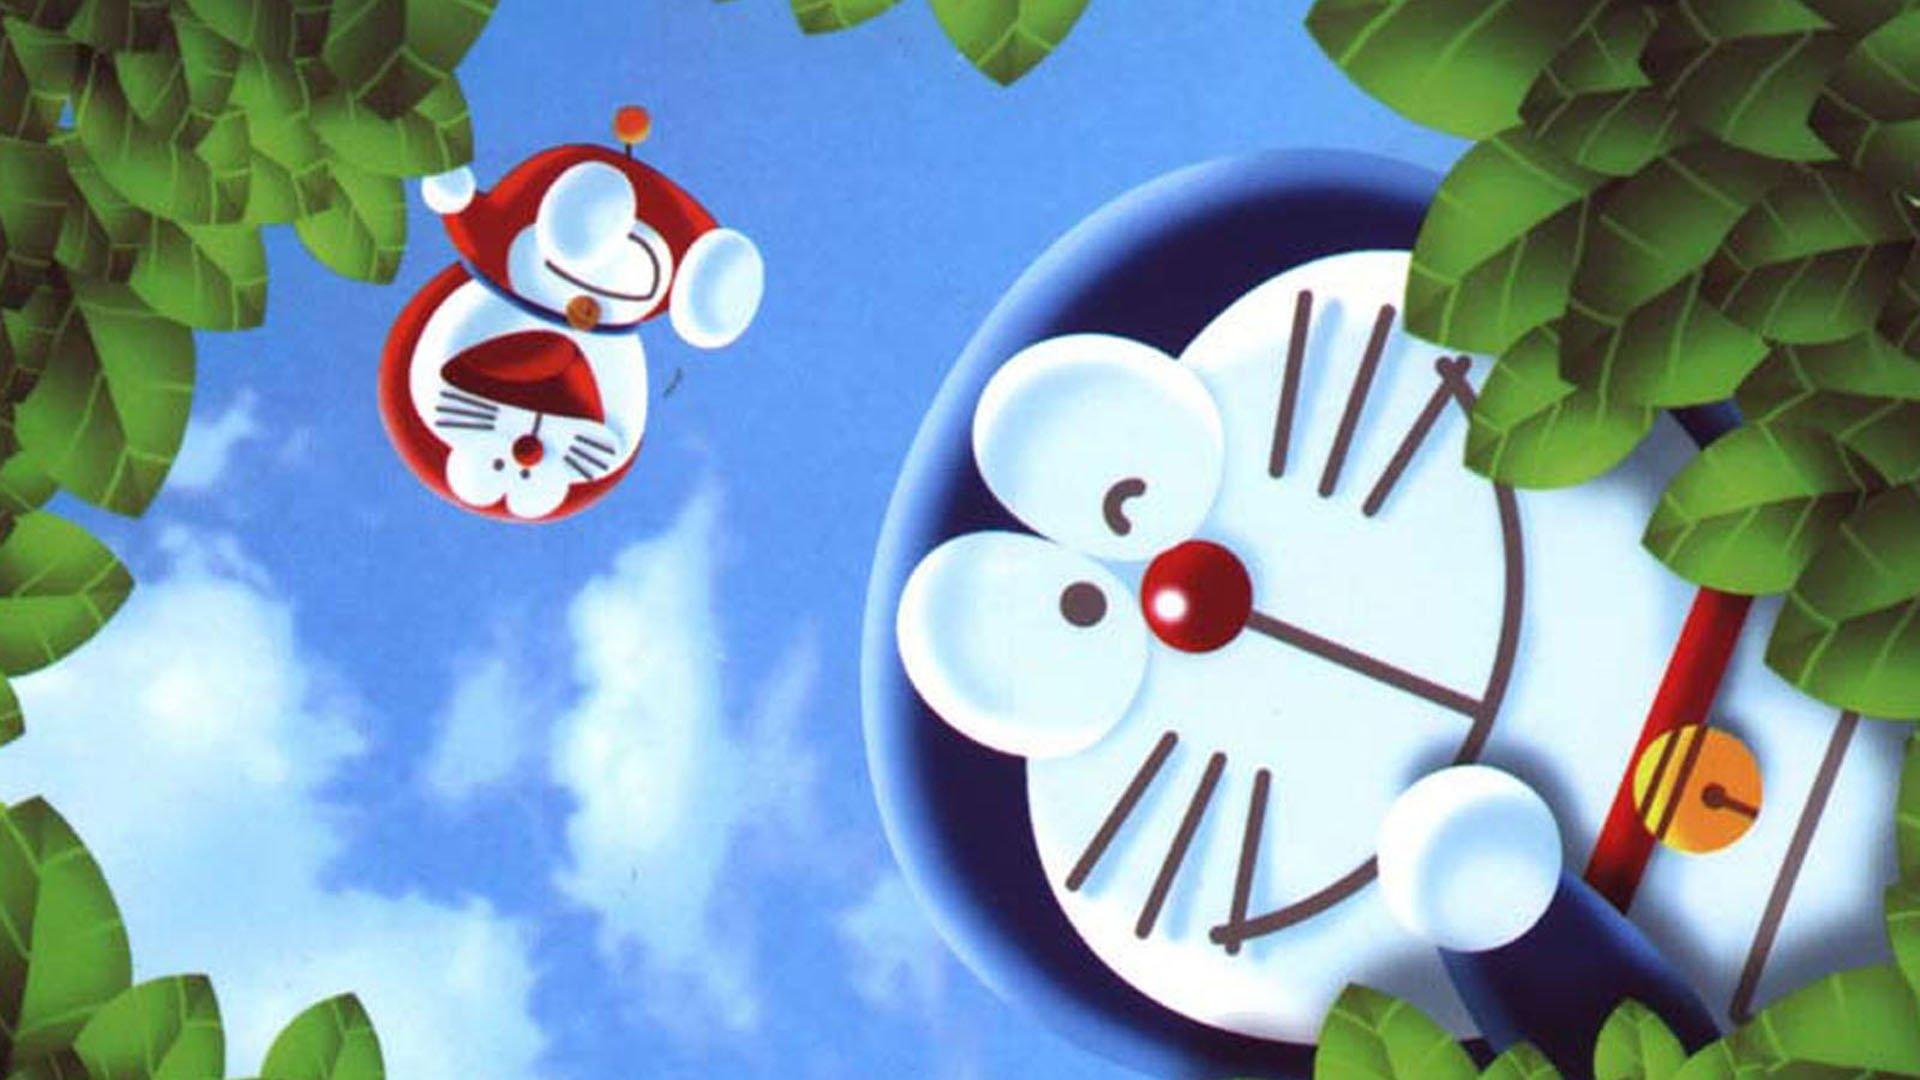 Download wallpaper doraemon free - Doraemon Image 1920x1080 Wallpapers 1920x1080 Wallpapers Pictures